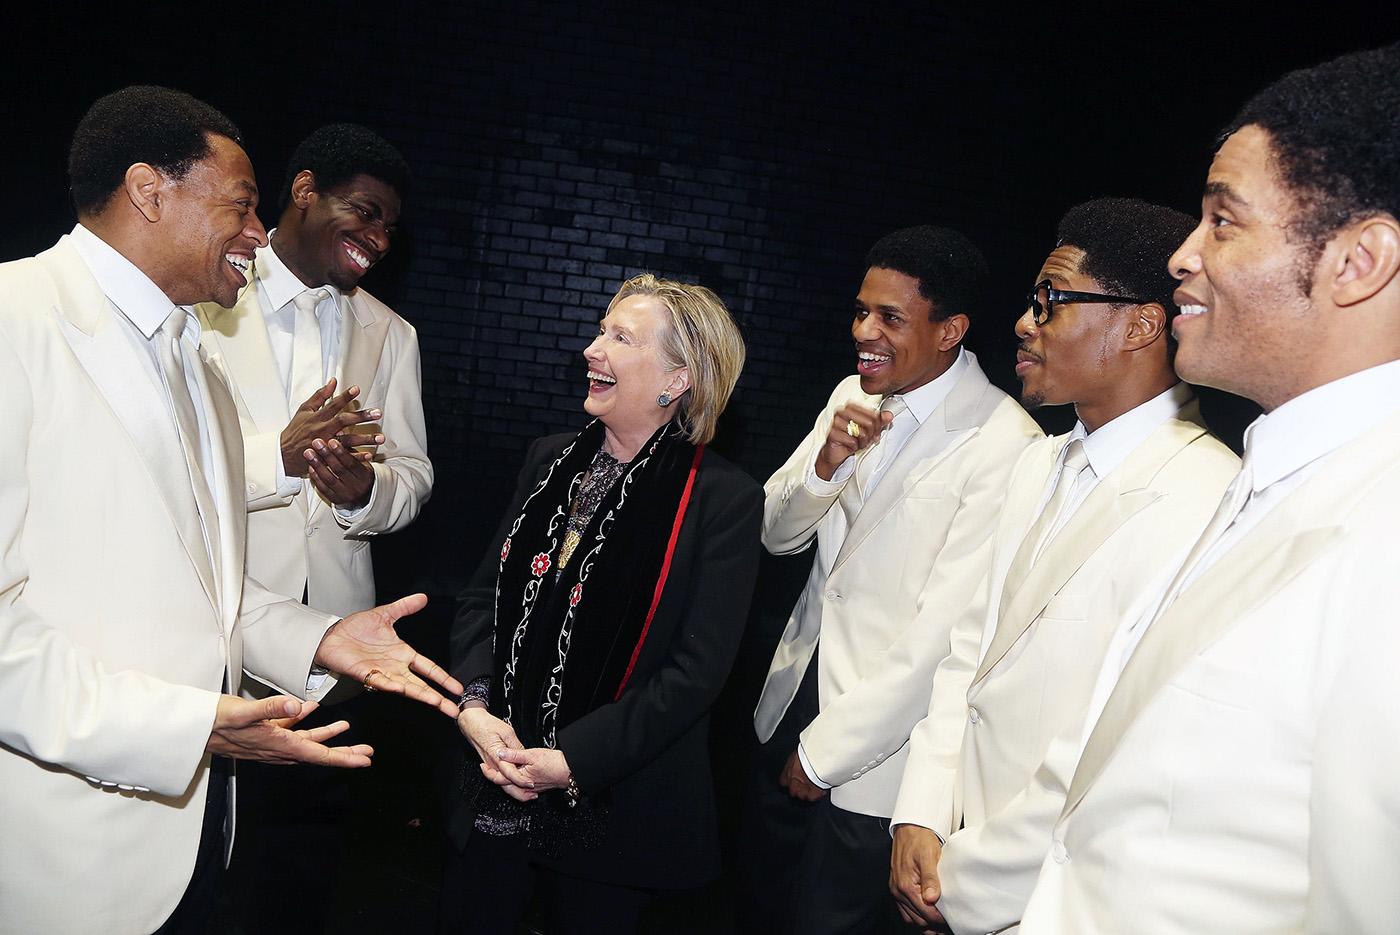 Hilary! The great theatromaniac